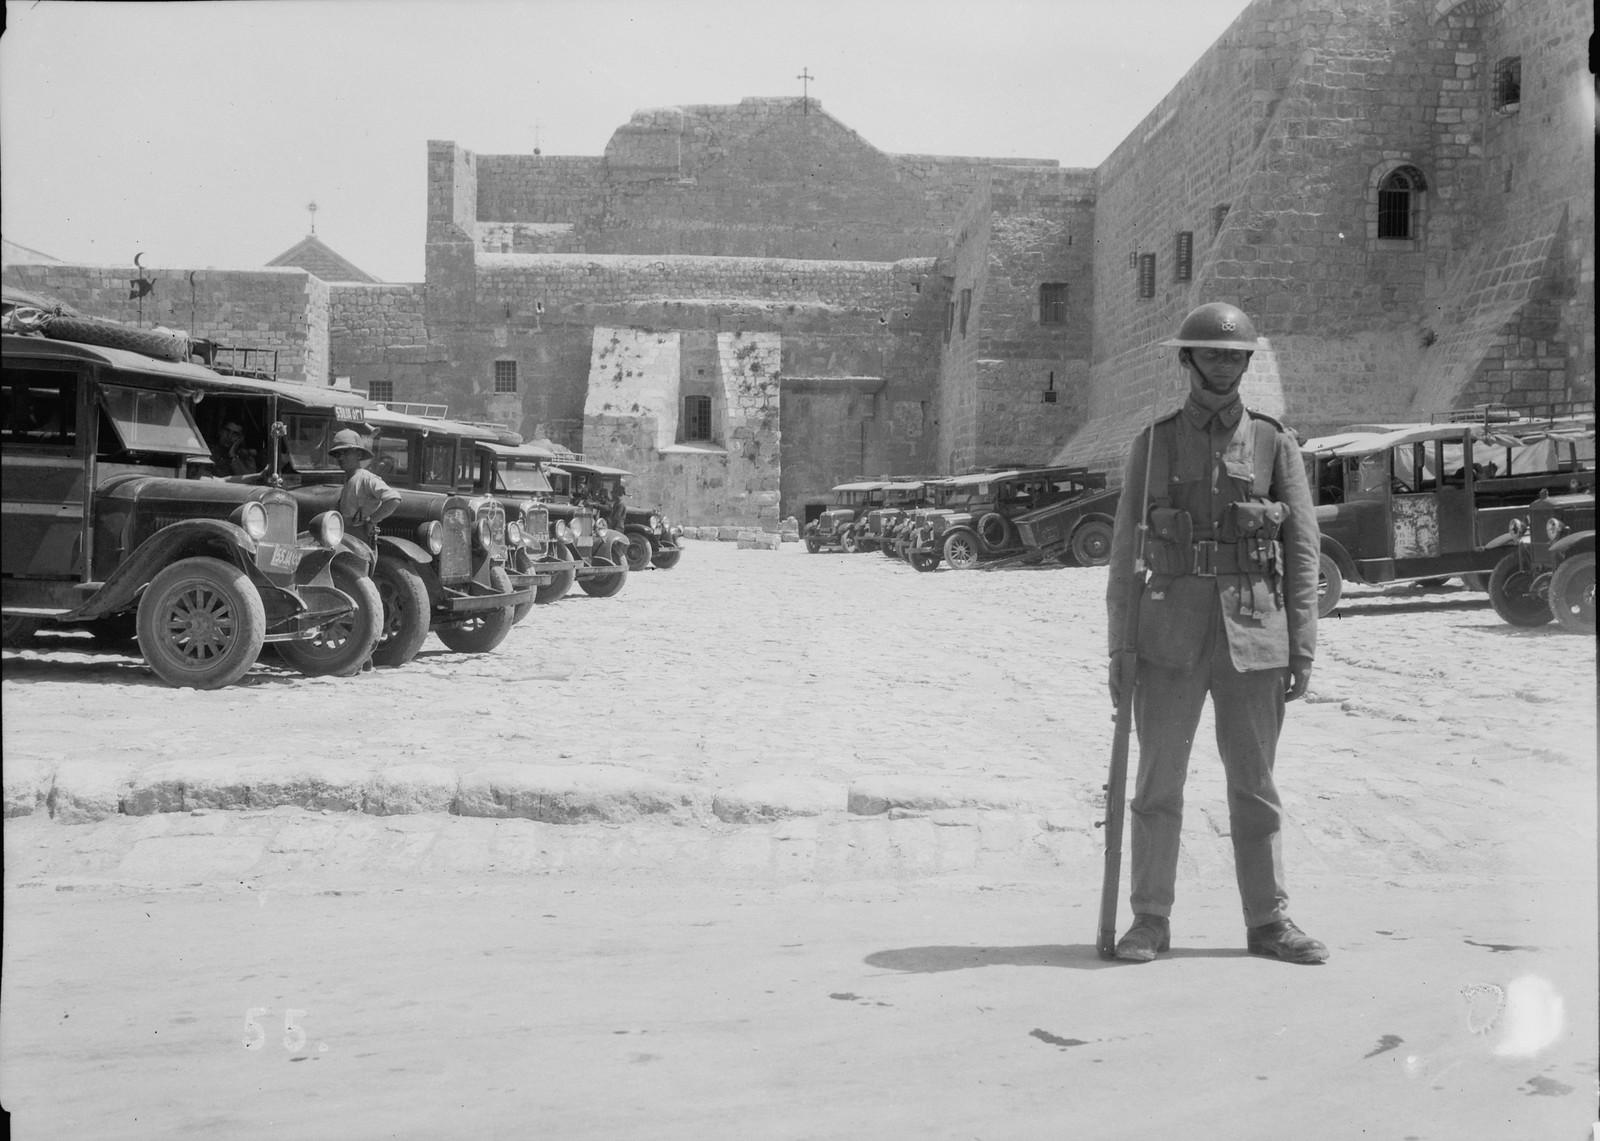 22. 23–31 августа. Военная охрана у церкви Рождества Христова в Вифлееме